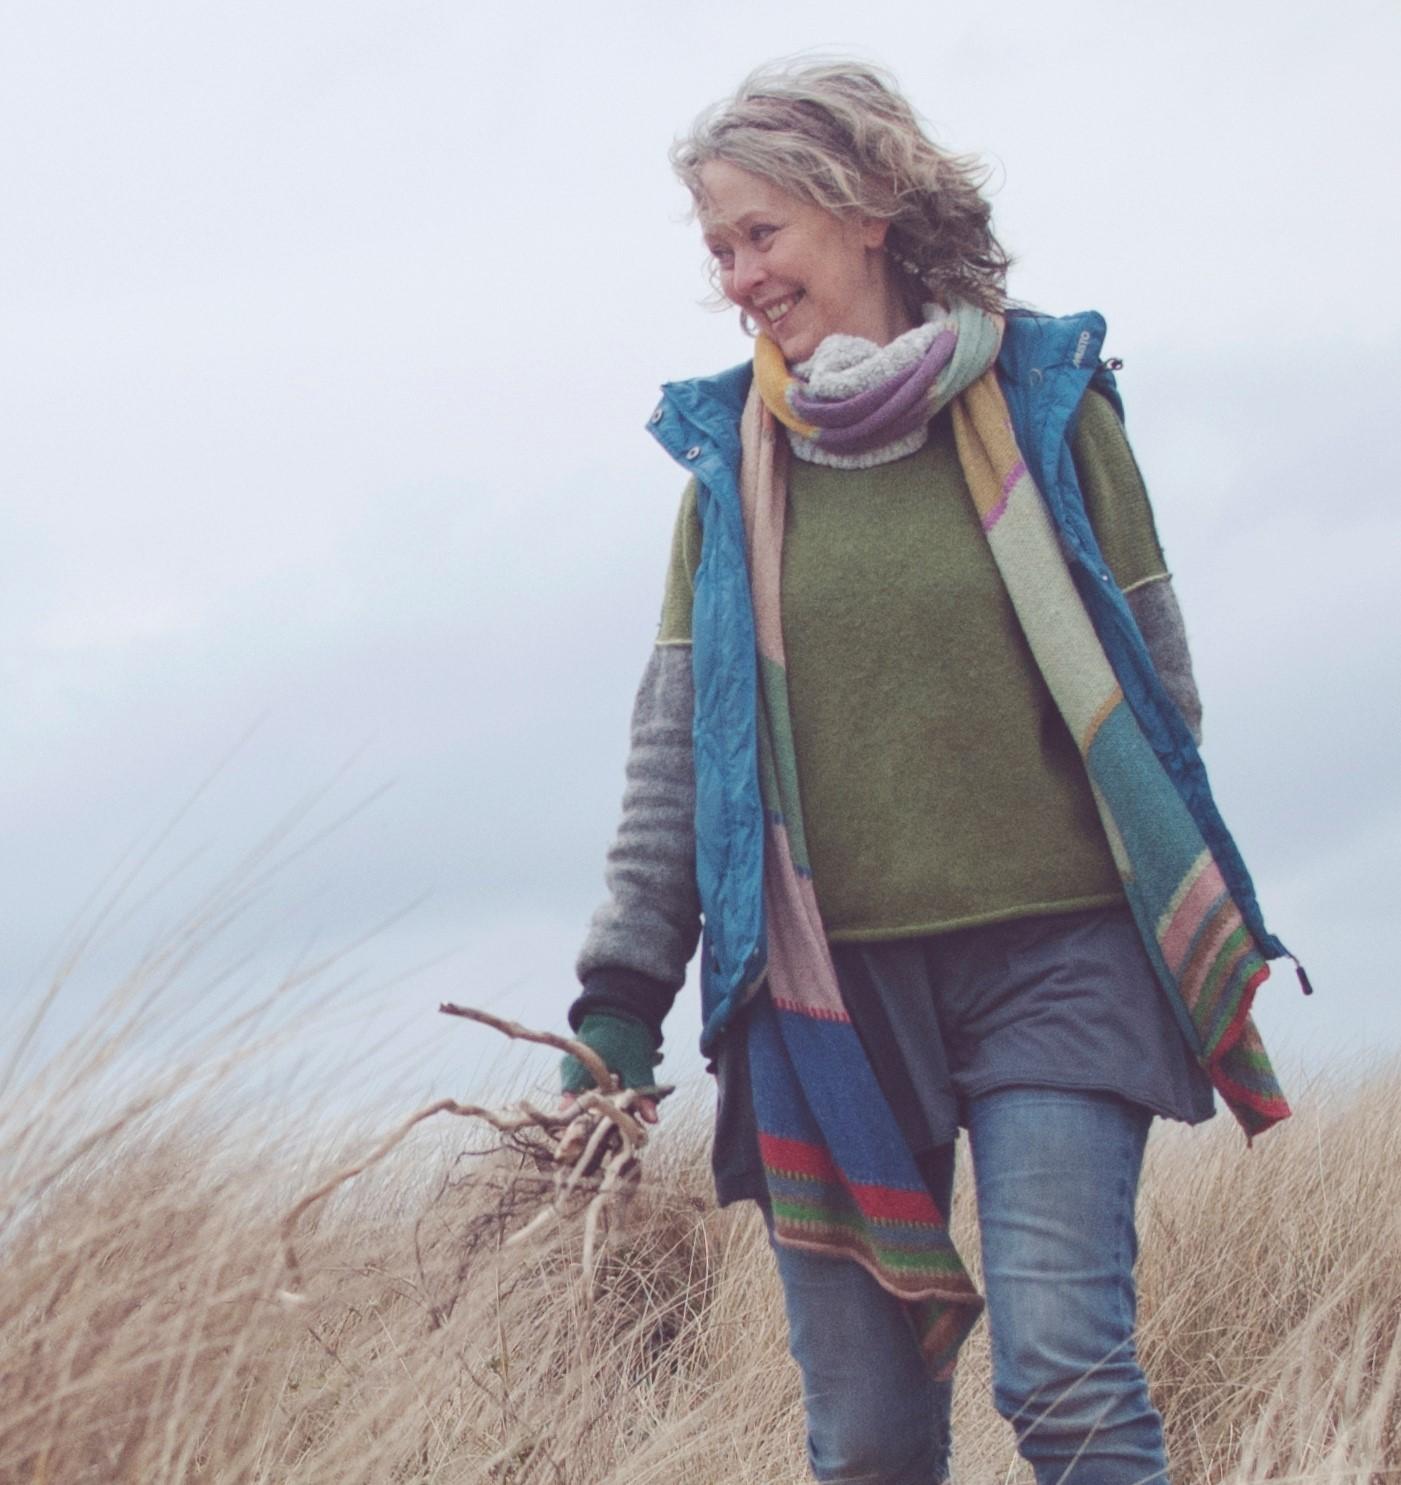 Malvern woman Brigit Strawbridge Howard writes book inspired by her love of bees